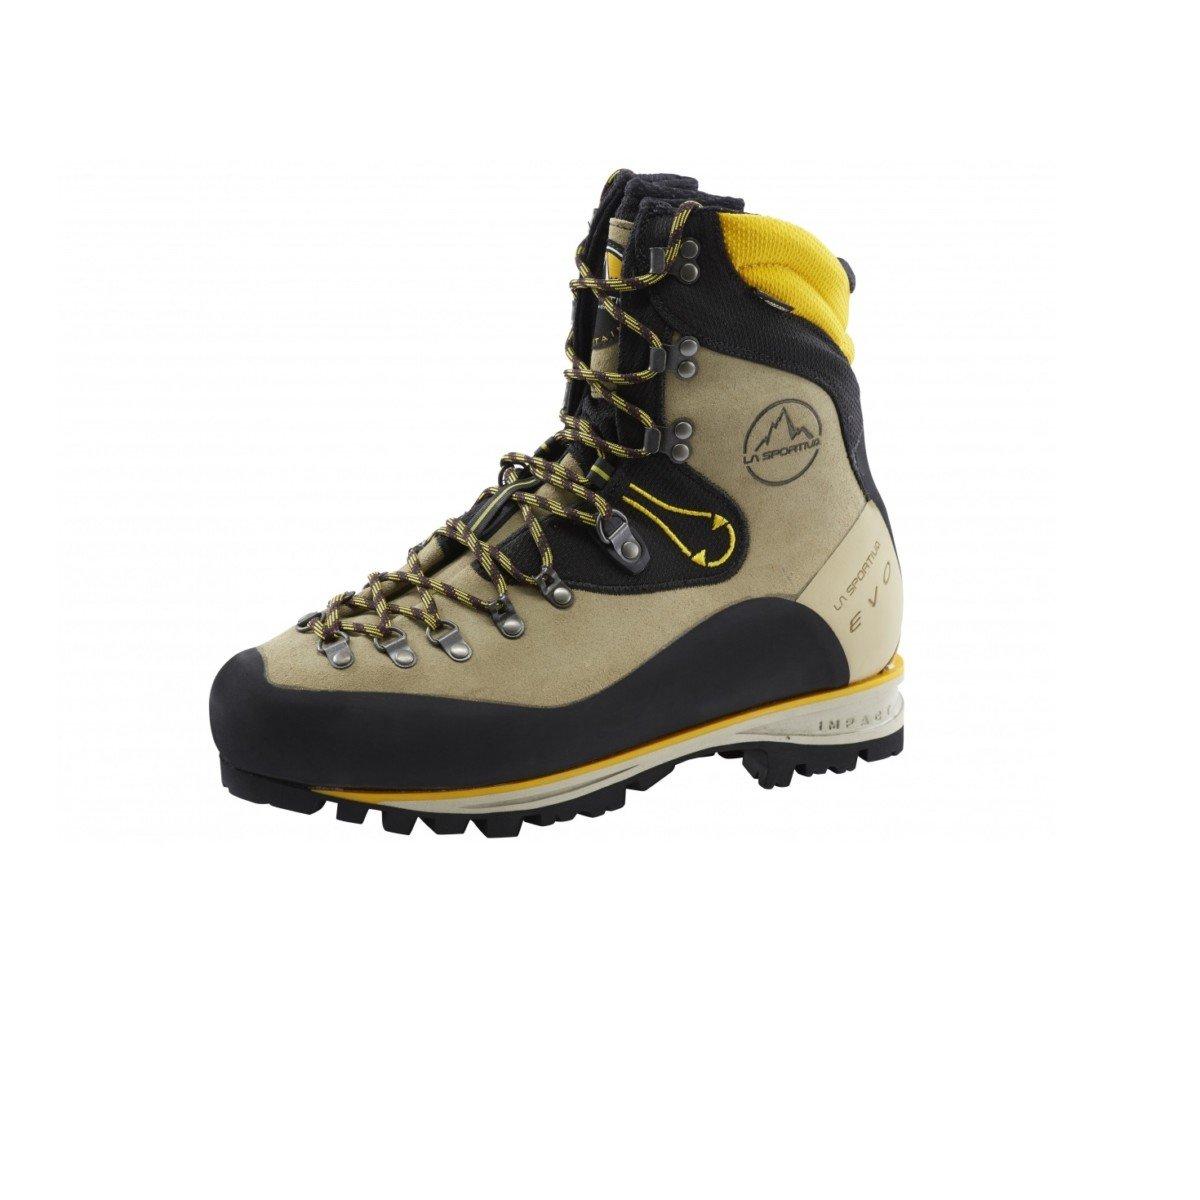 new appearance order online how to buy La Sportiva Nepal Trek EVO GTX, chaussure de montagne homme.